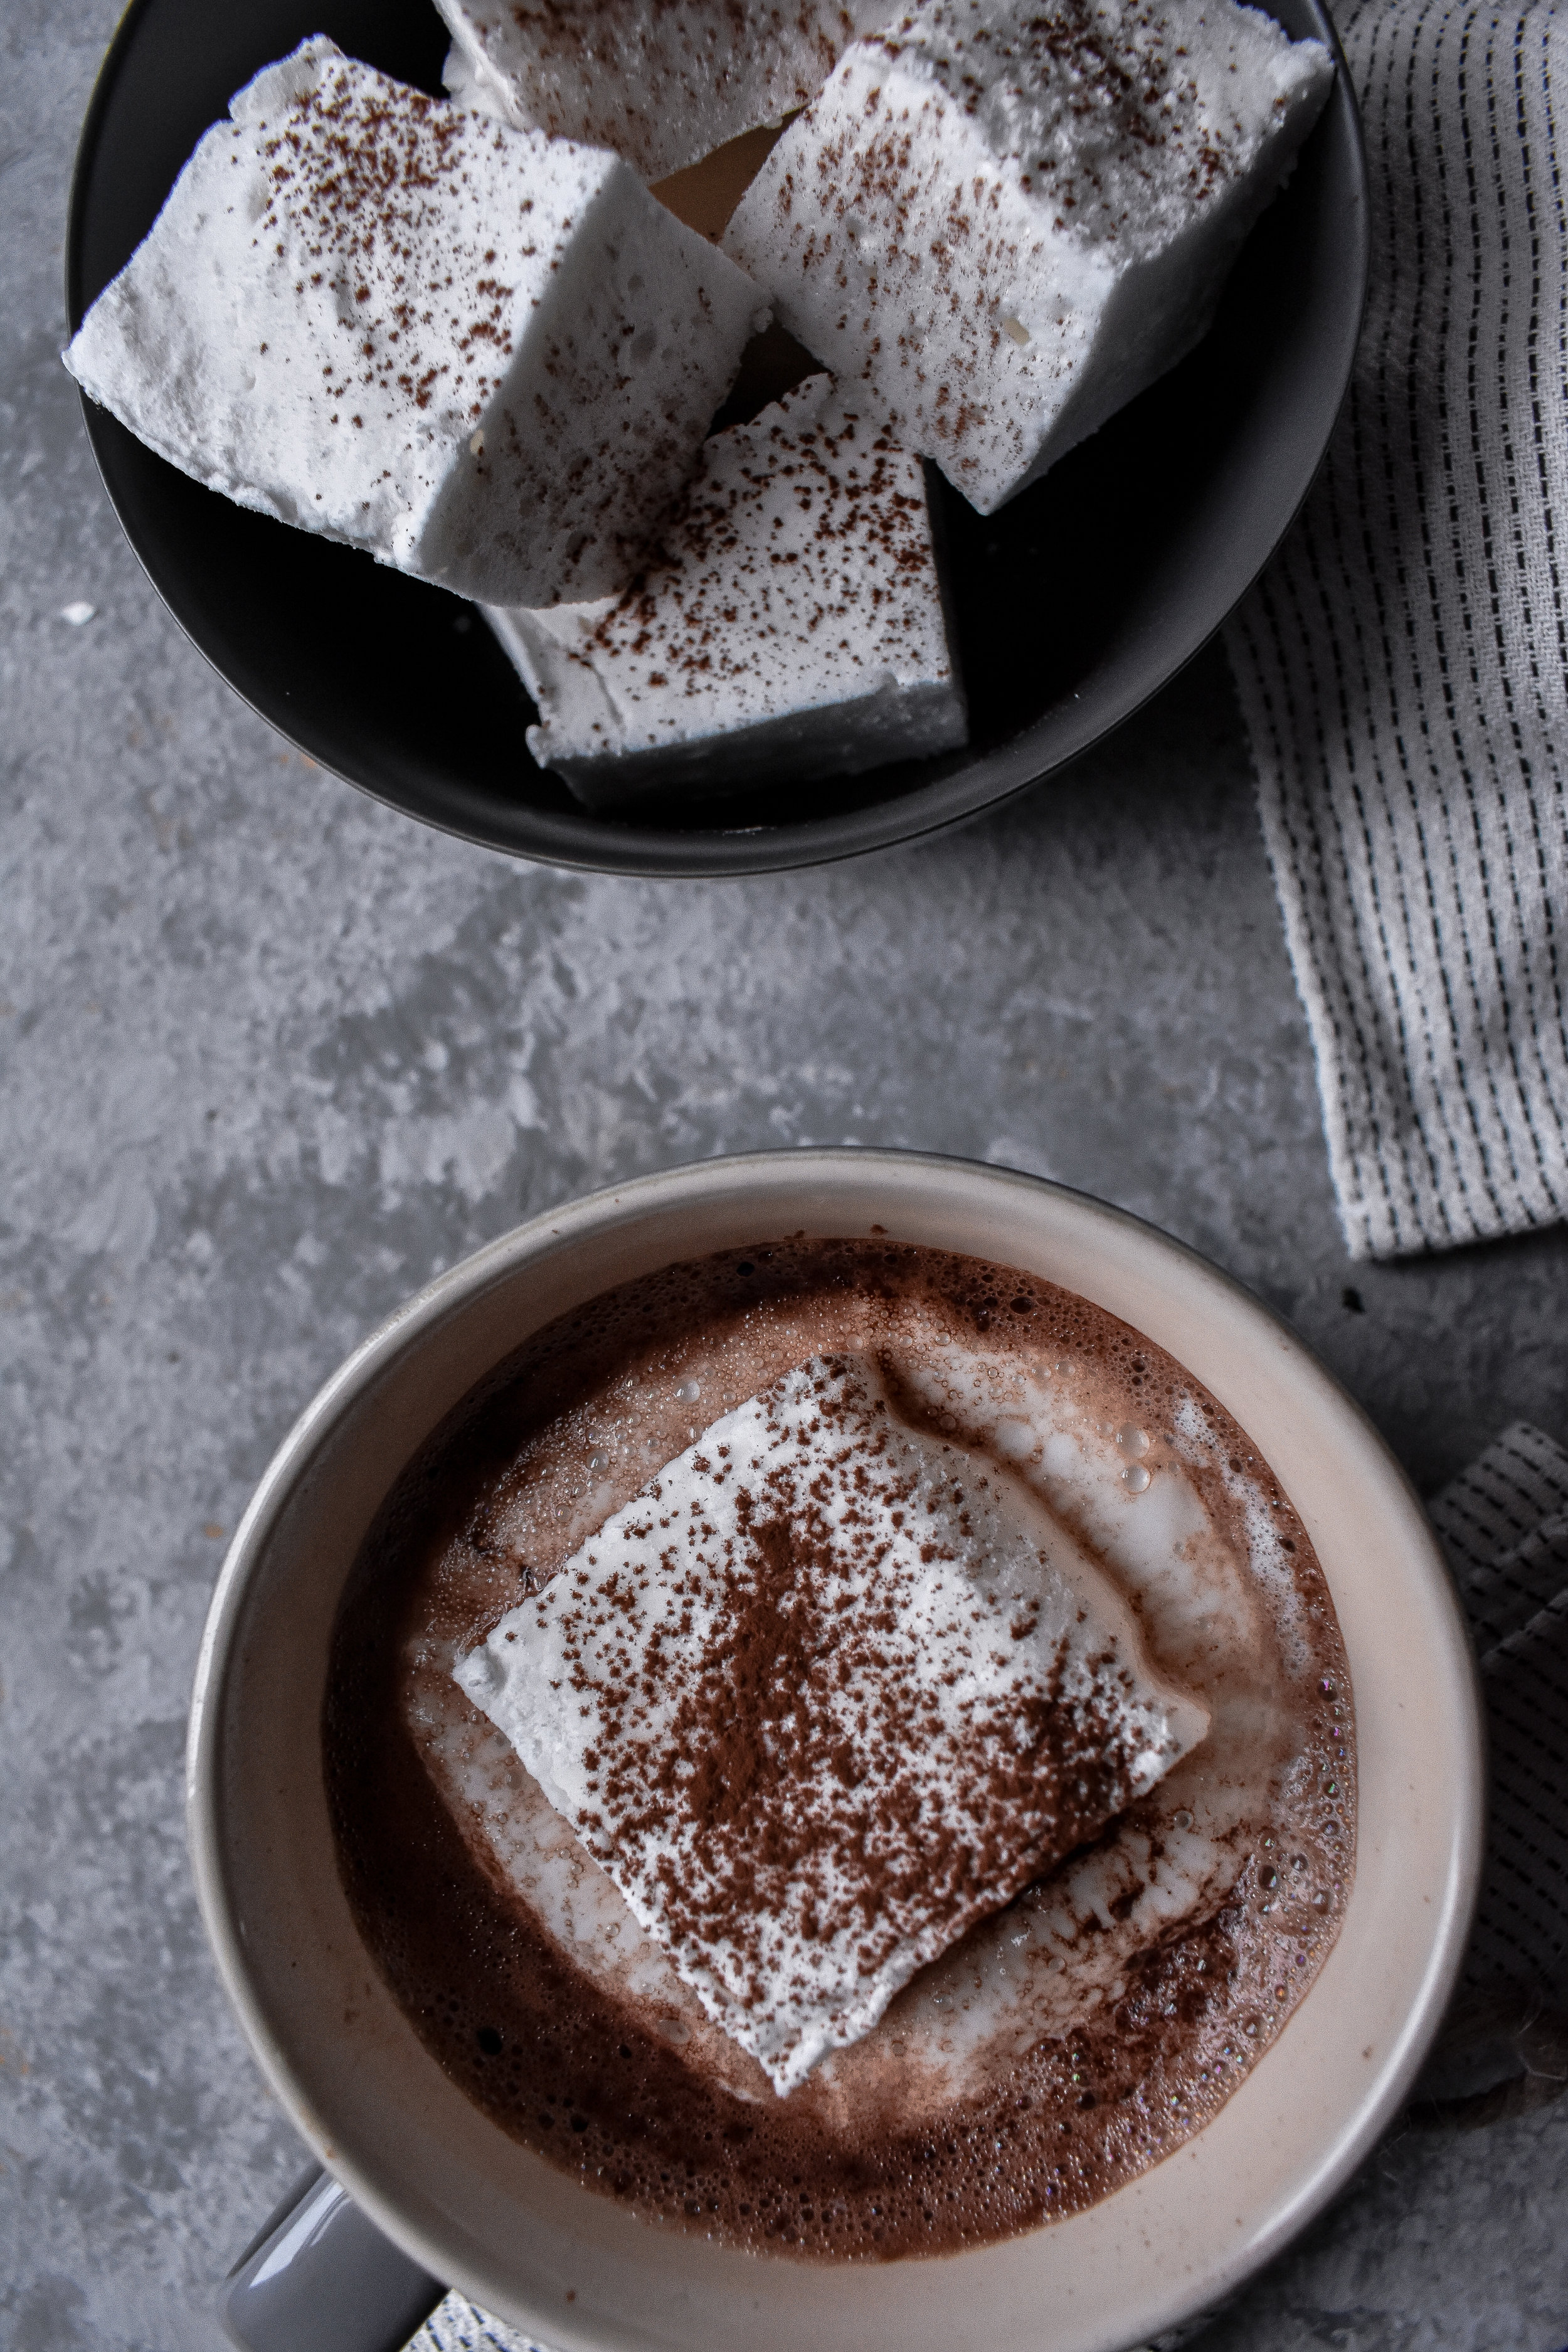 Green & Blacks Hot Chocolate with Vanilla Marshmallow